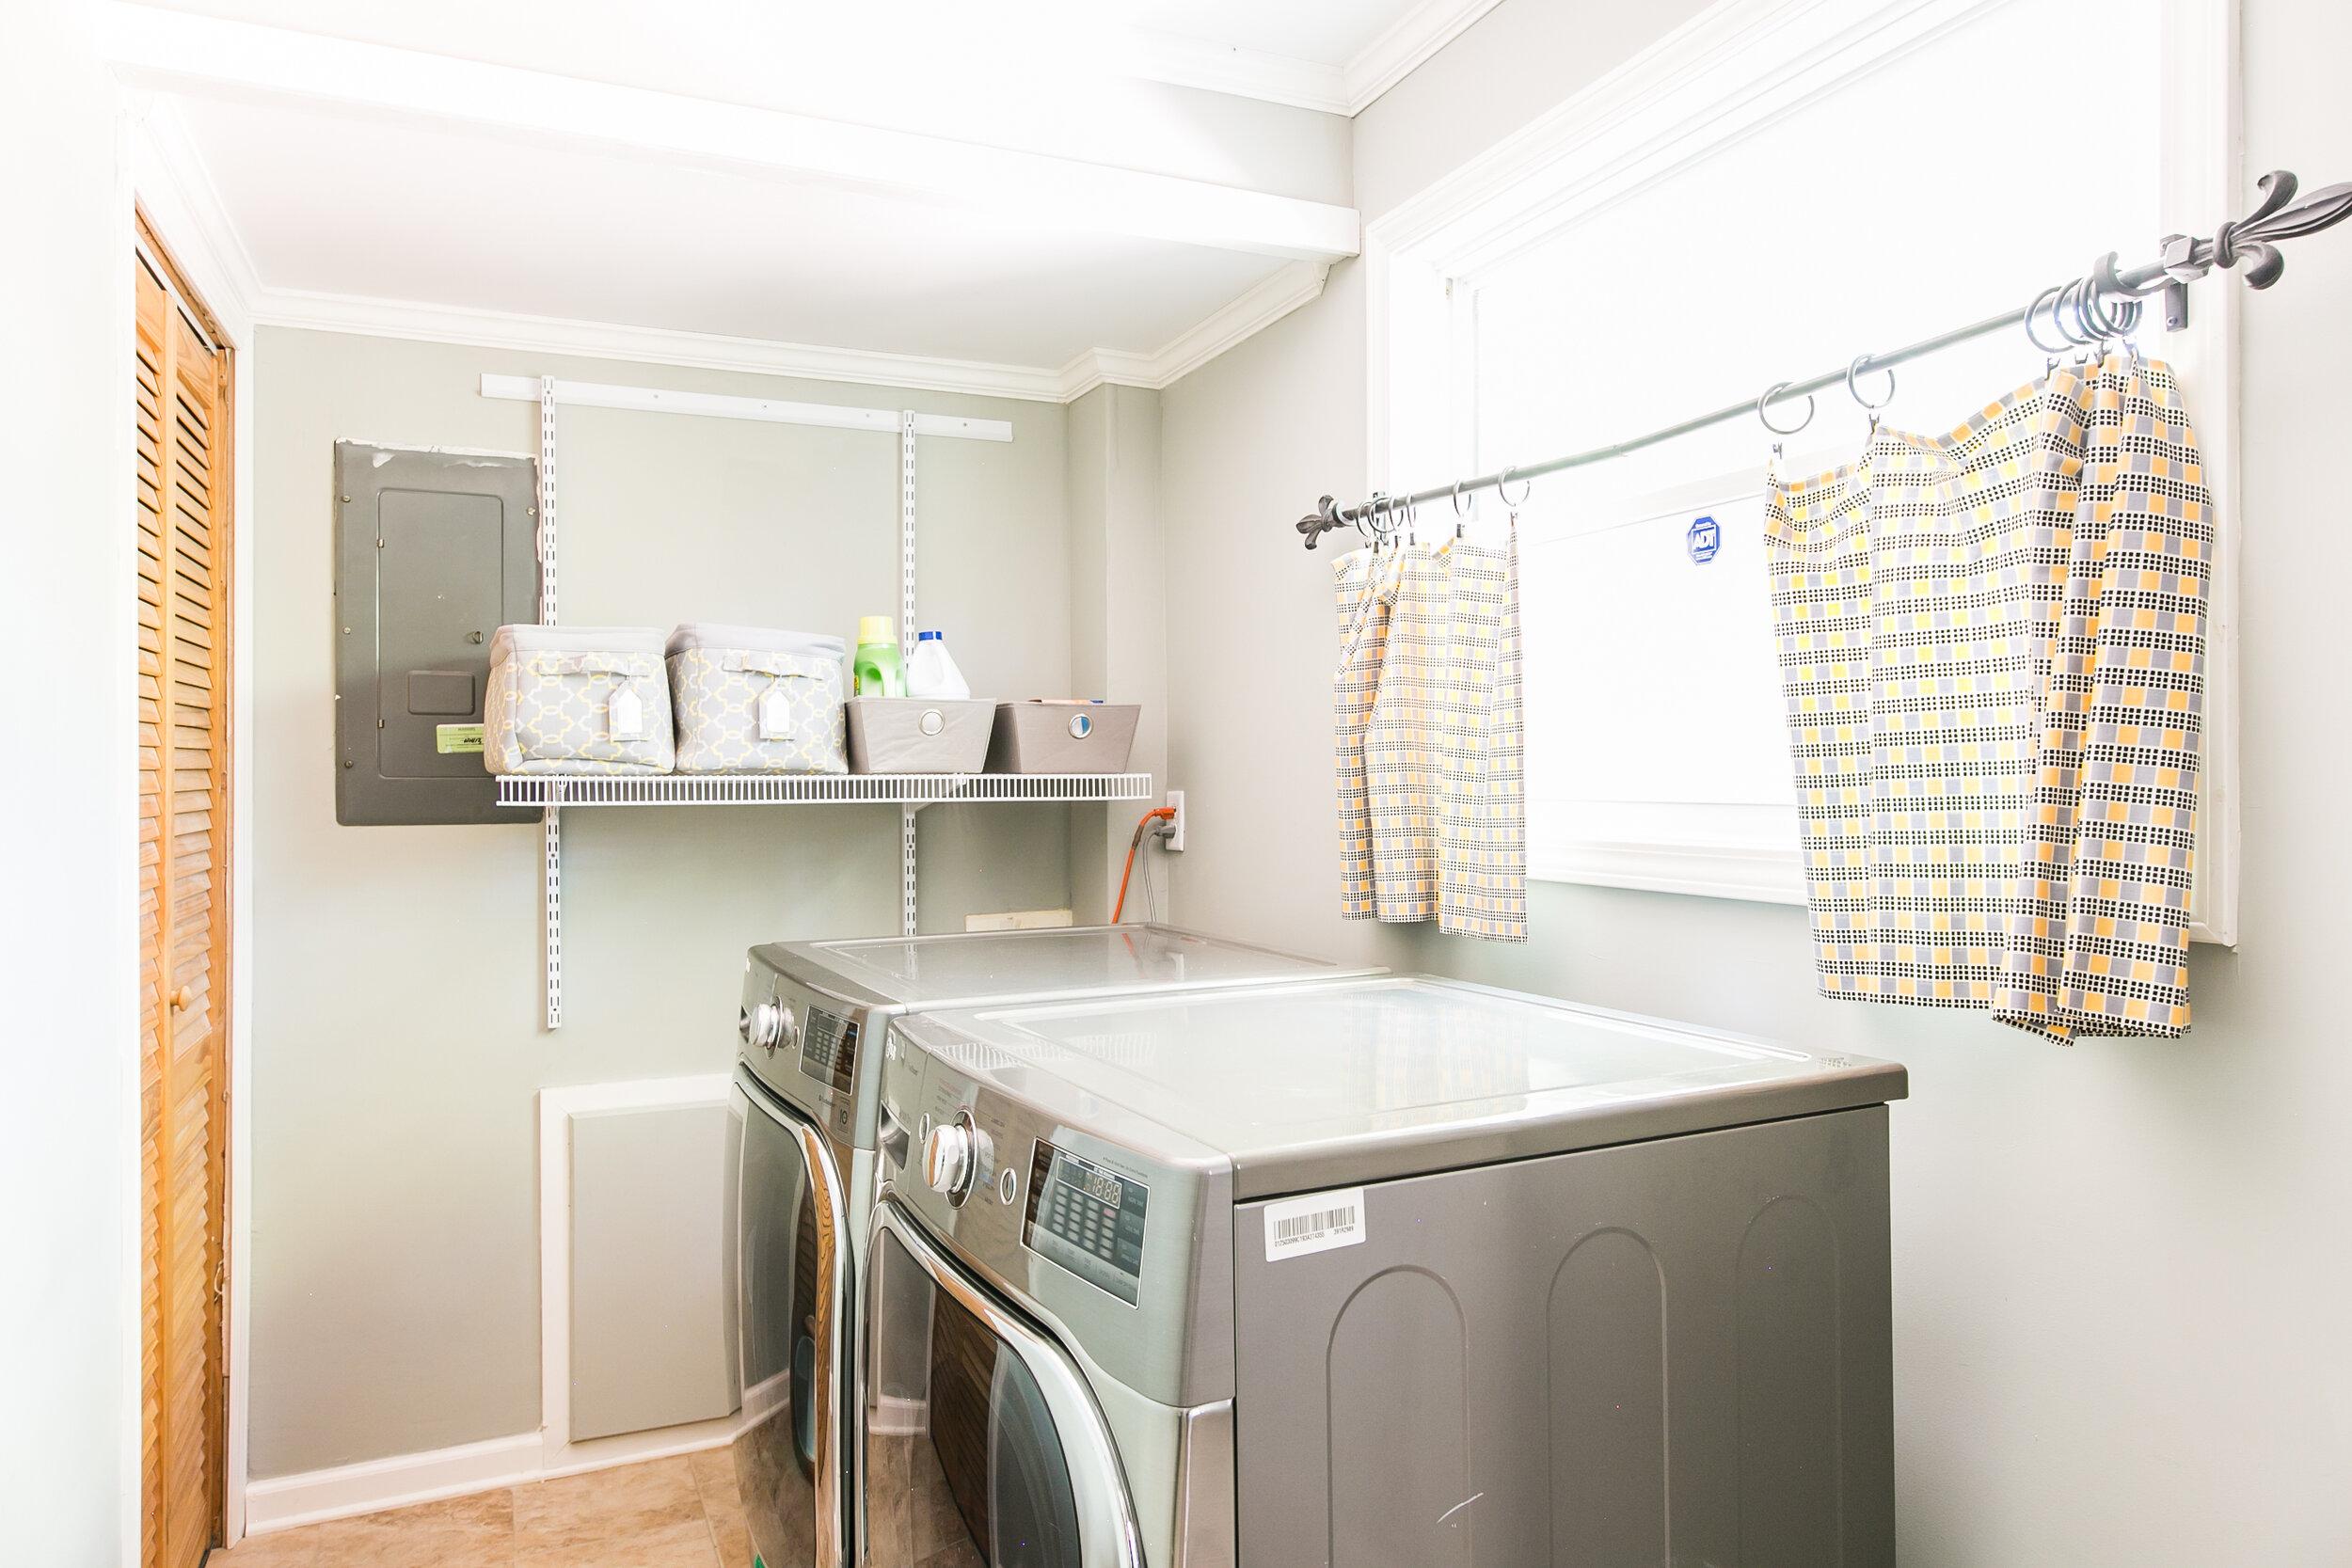 closet-laundry room.jpg